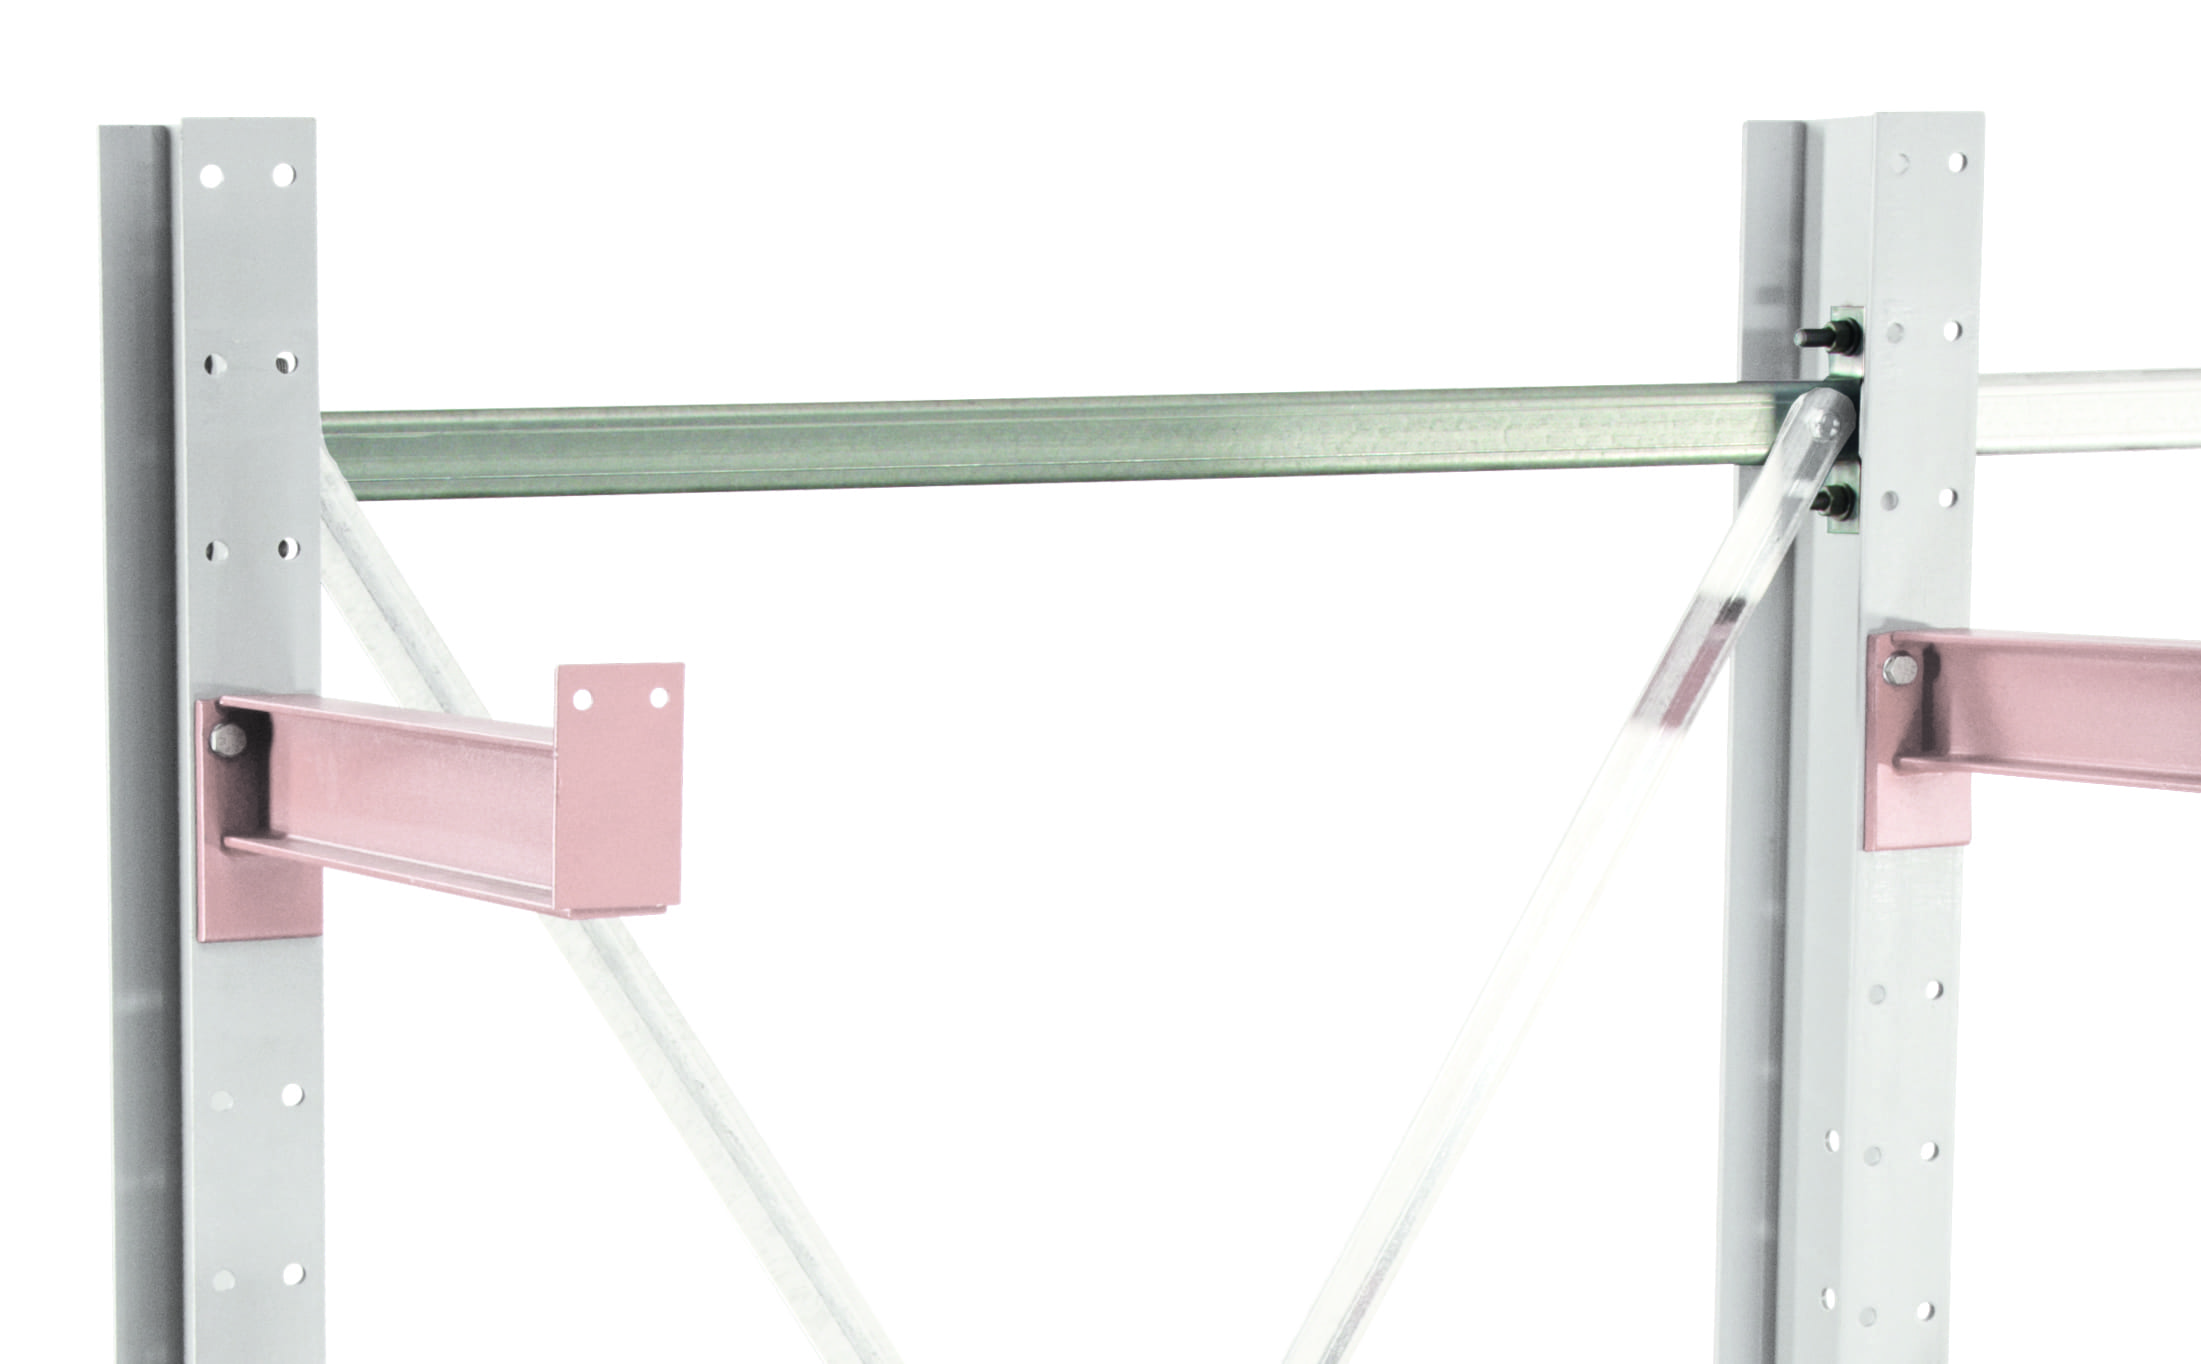 K 3000 Horizontalverbinder – inkl. Schrauben